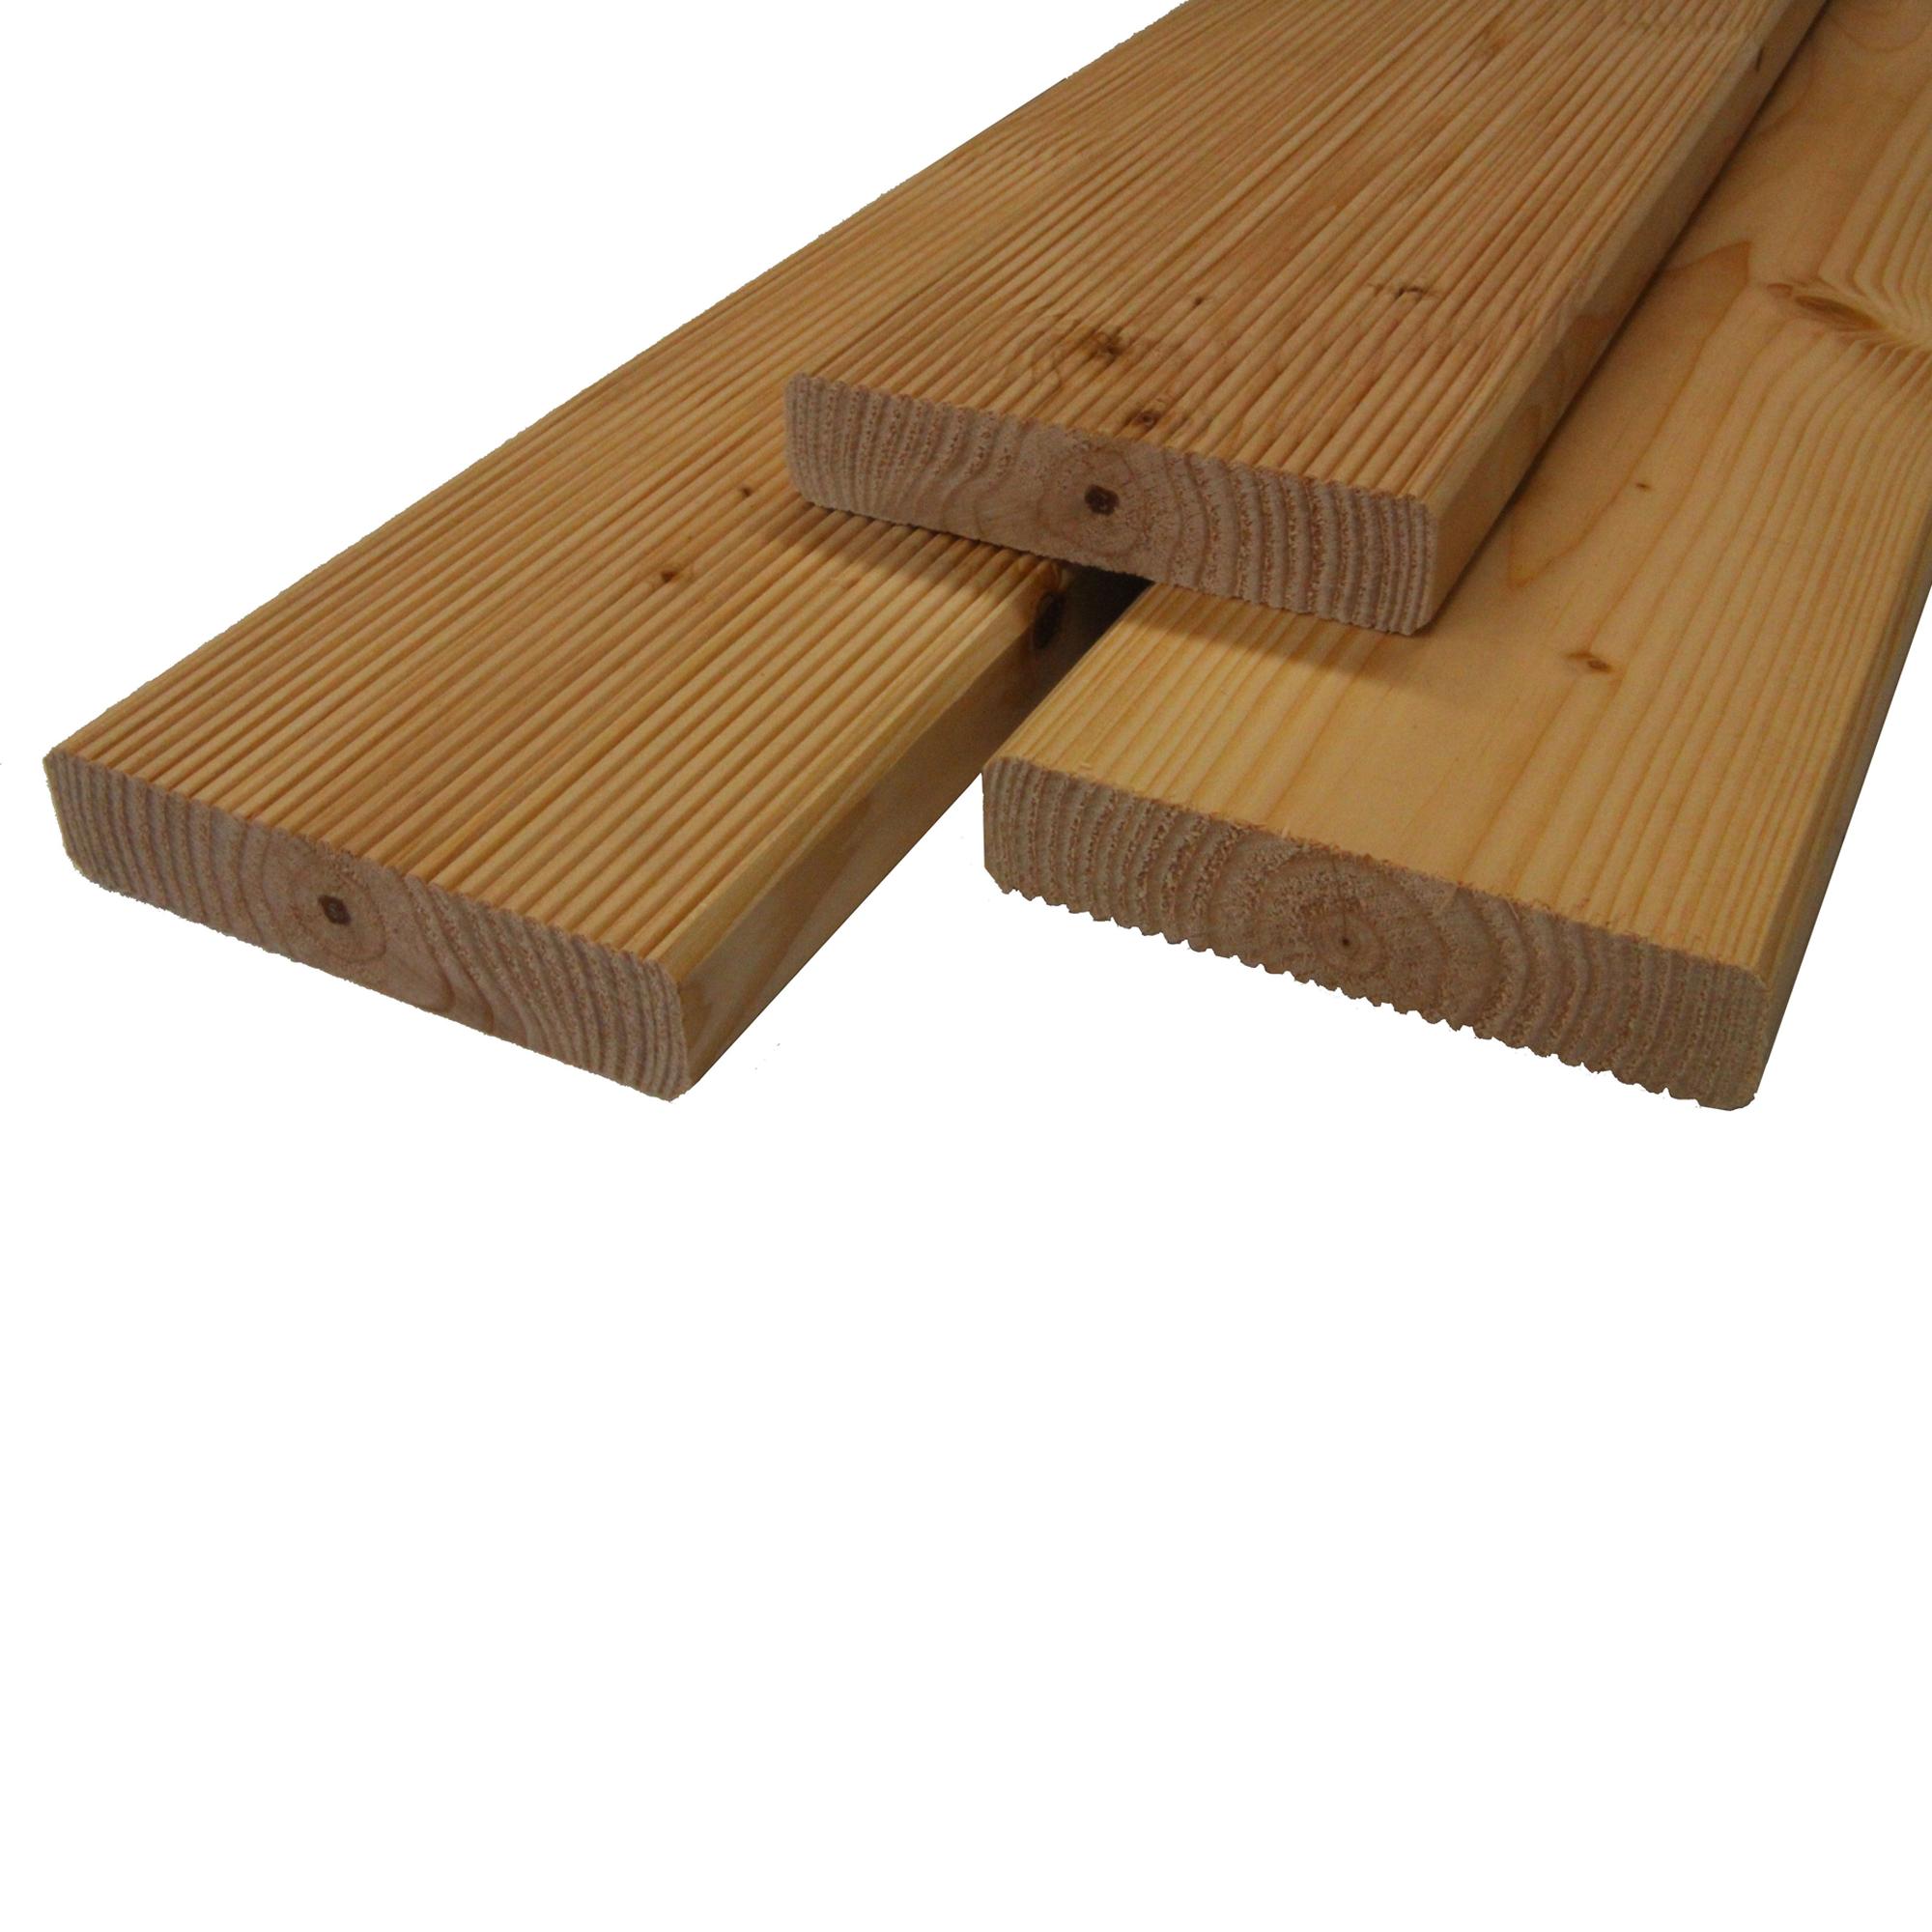 21+ Rettenmeier Do it Wood Universalbrett Douglasie 8 x 8 x 8 mm Galerie